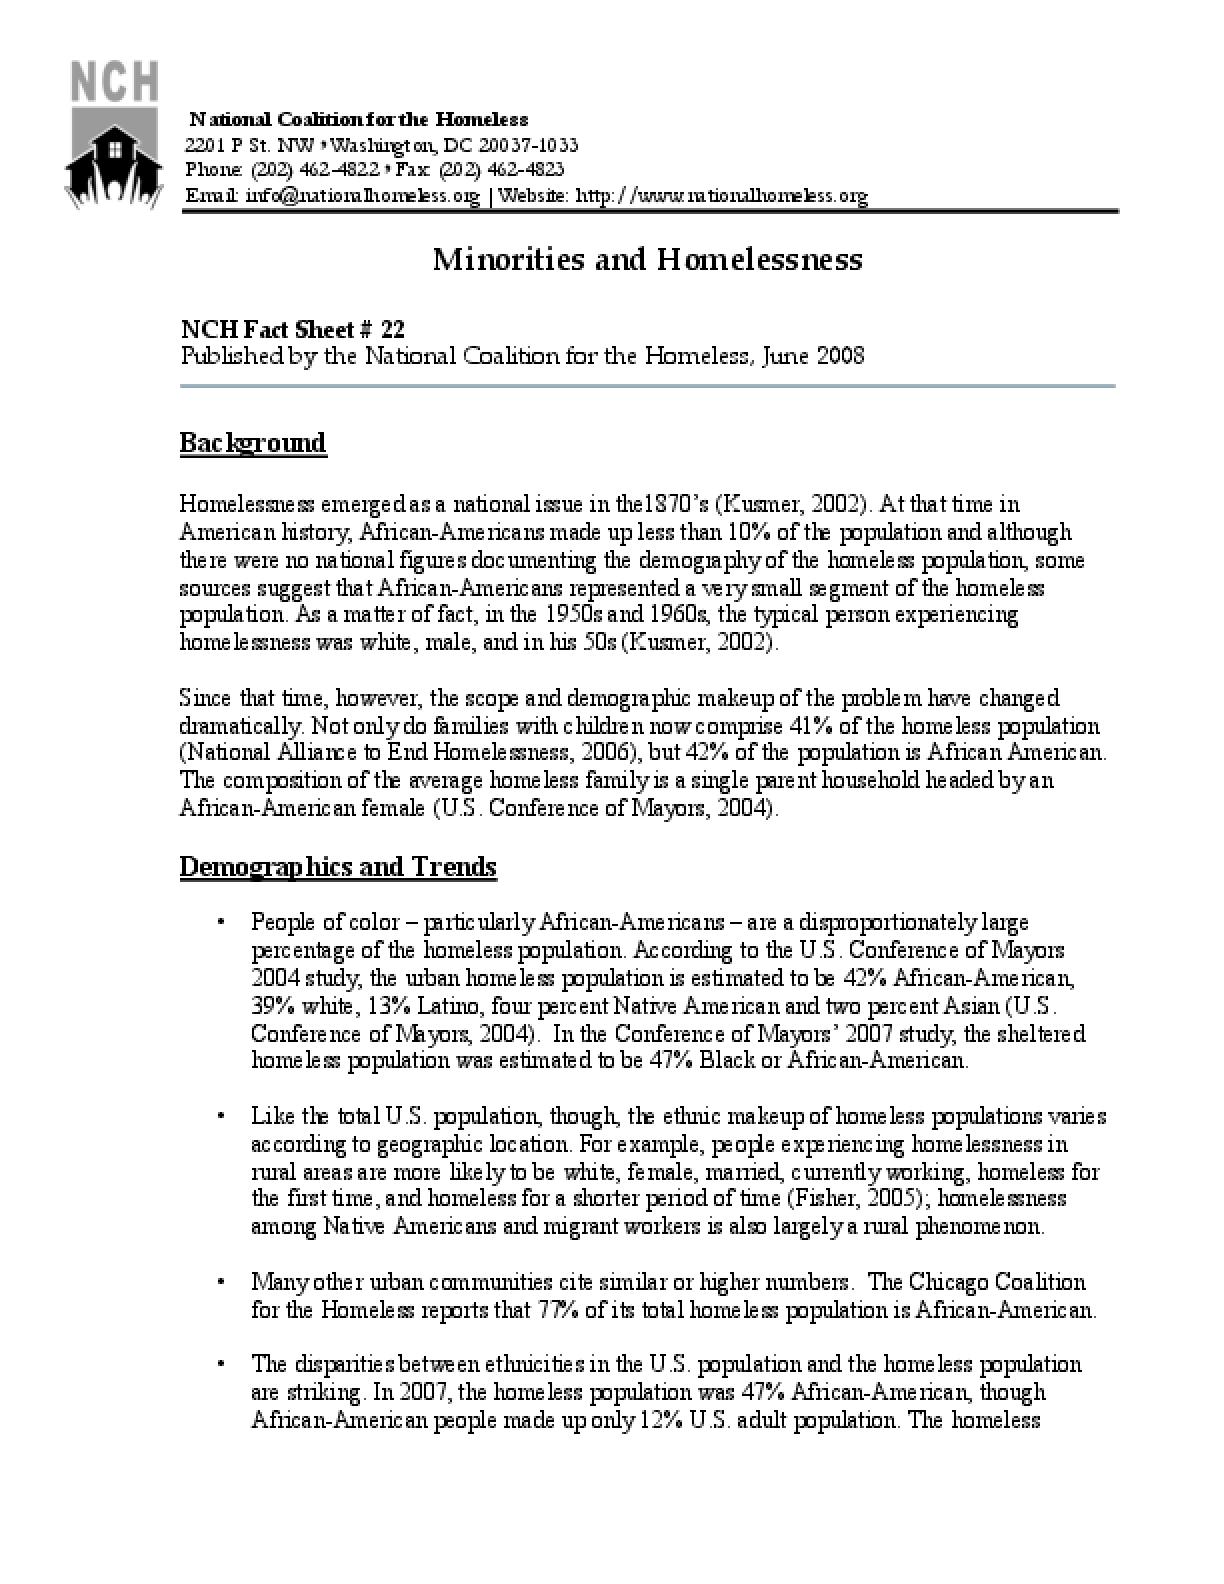 Minorities and Homelessness Factsheet